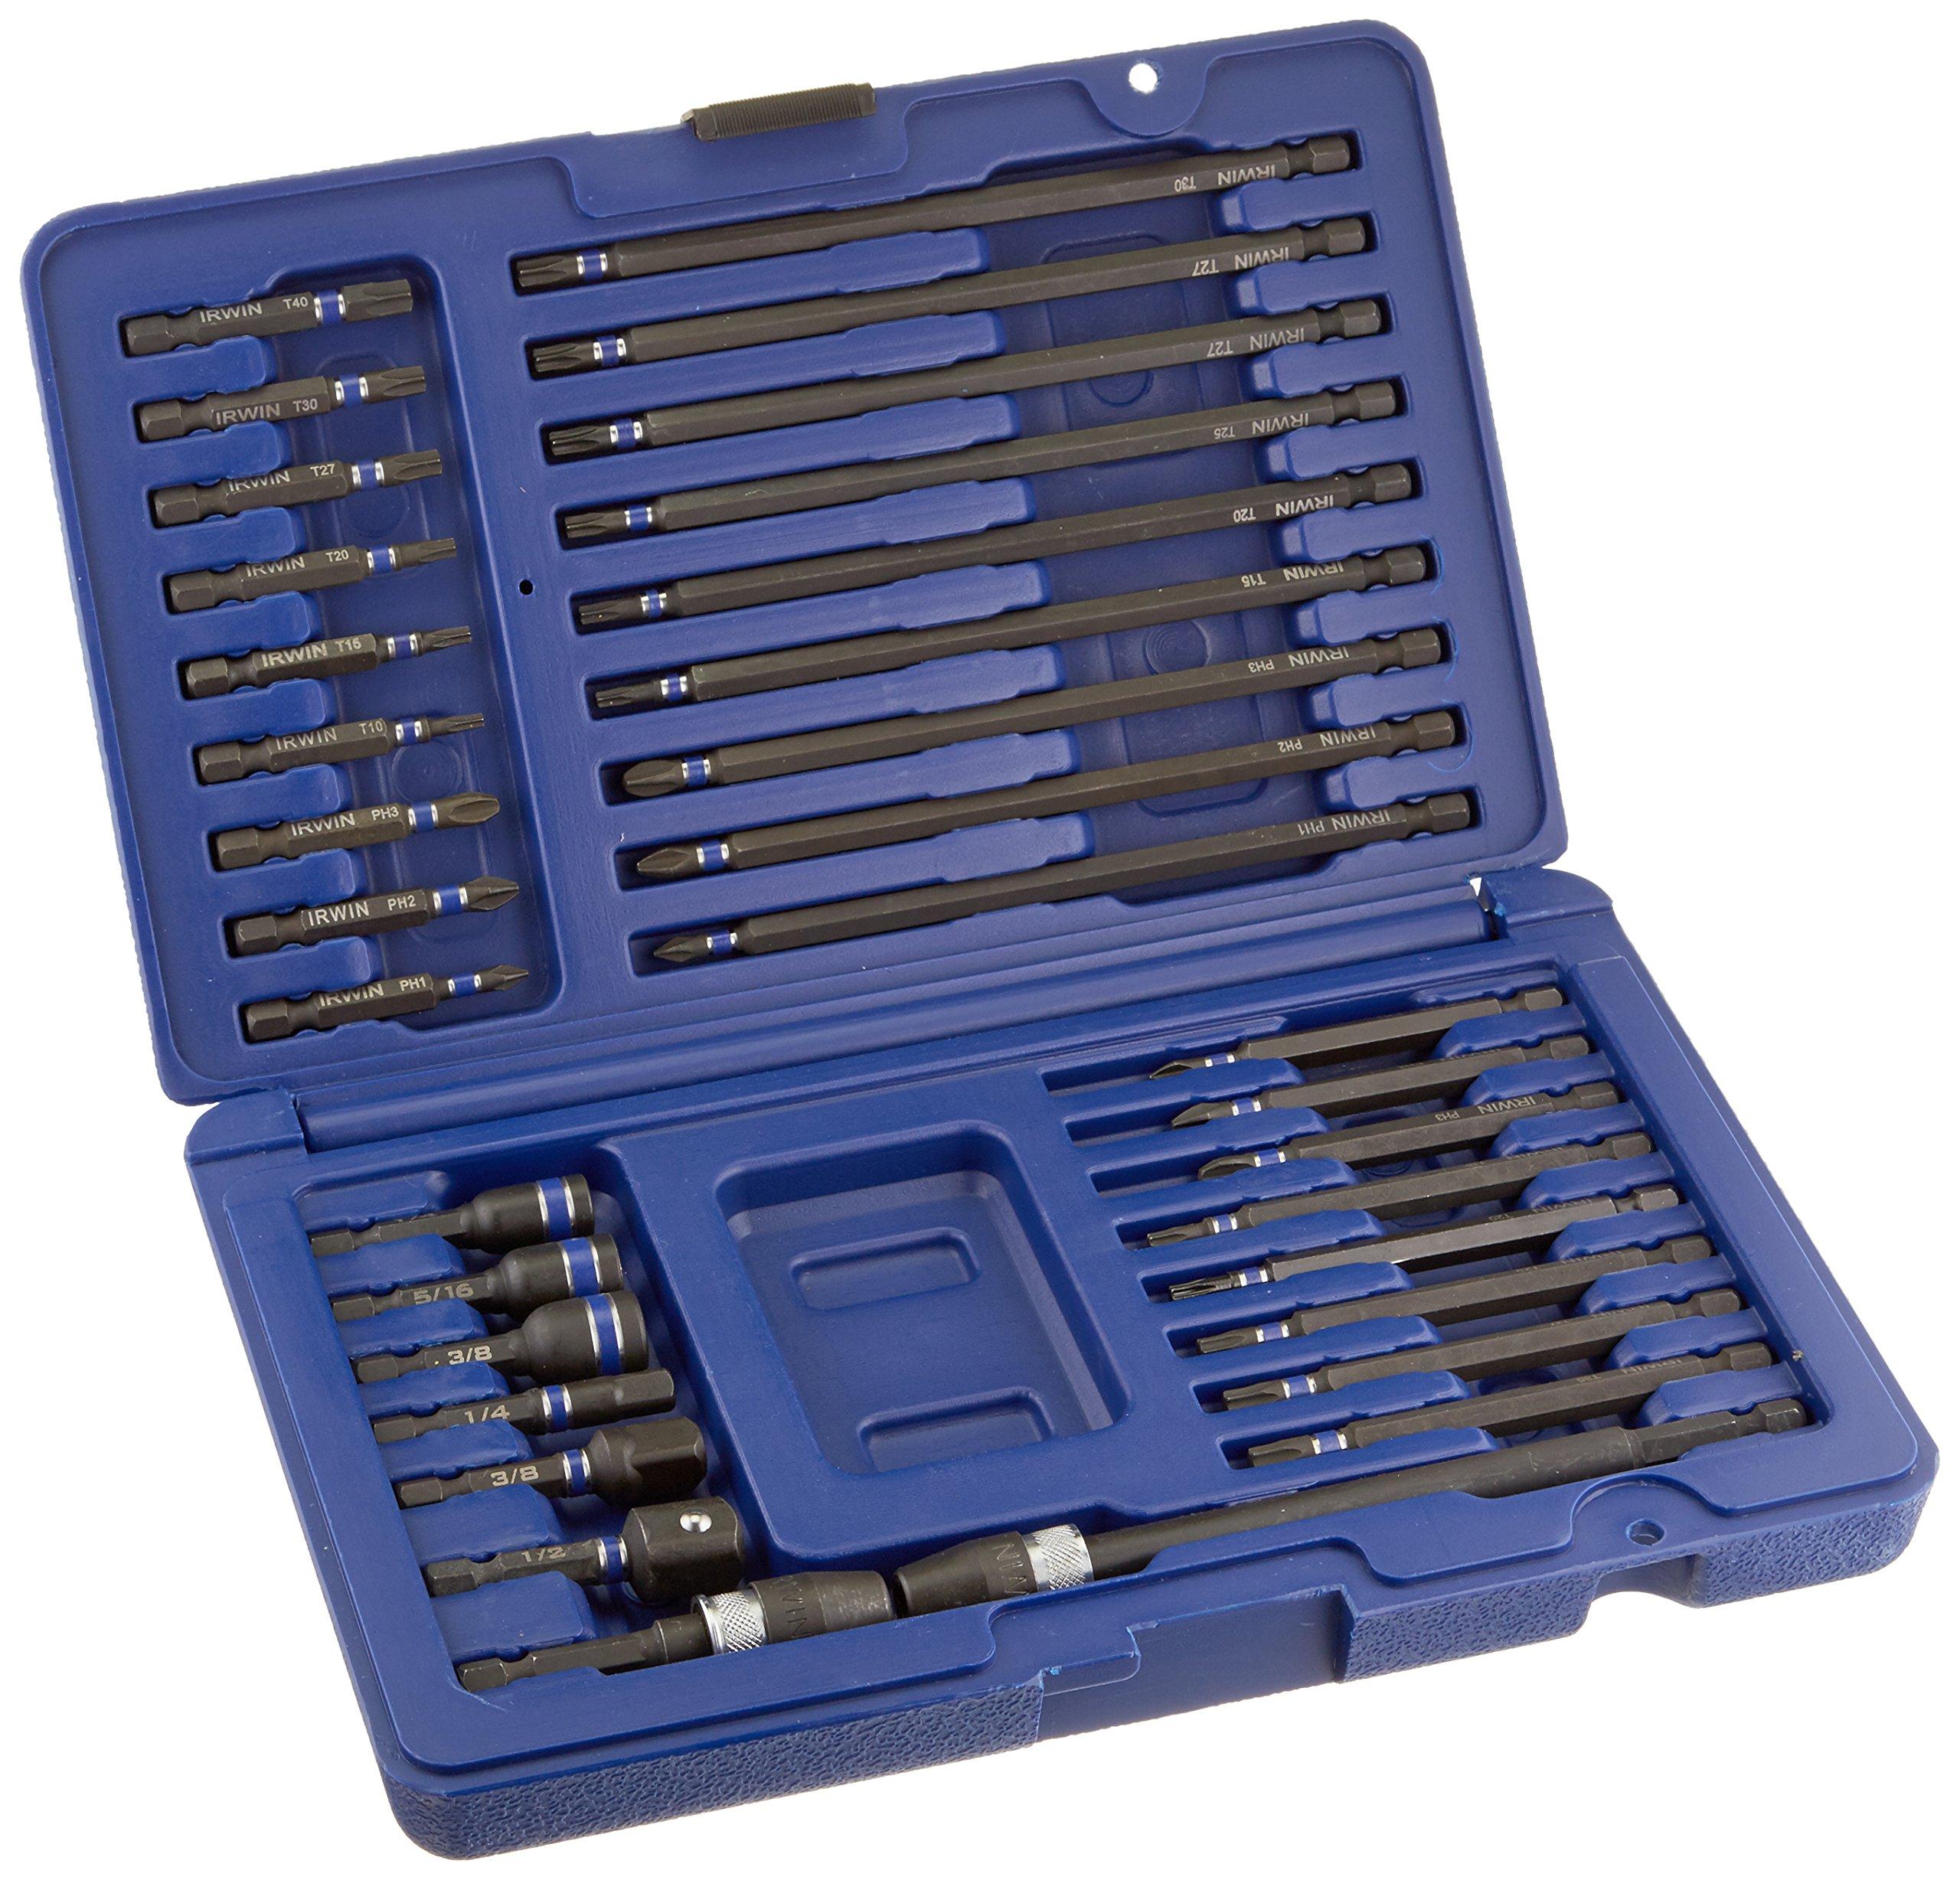 IRWIN Tools 34-Piece Impact Series Automotive Fastener Drive Bit Set (1840391)